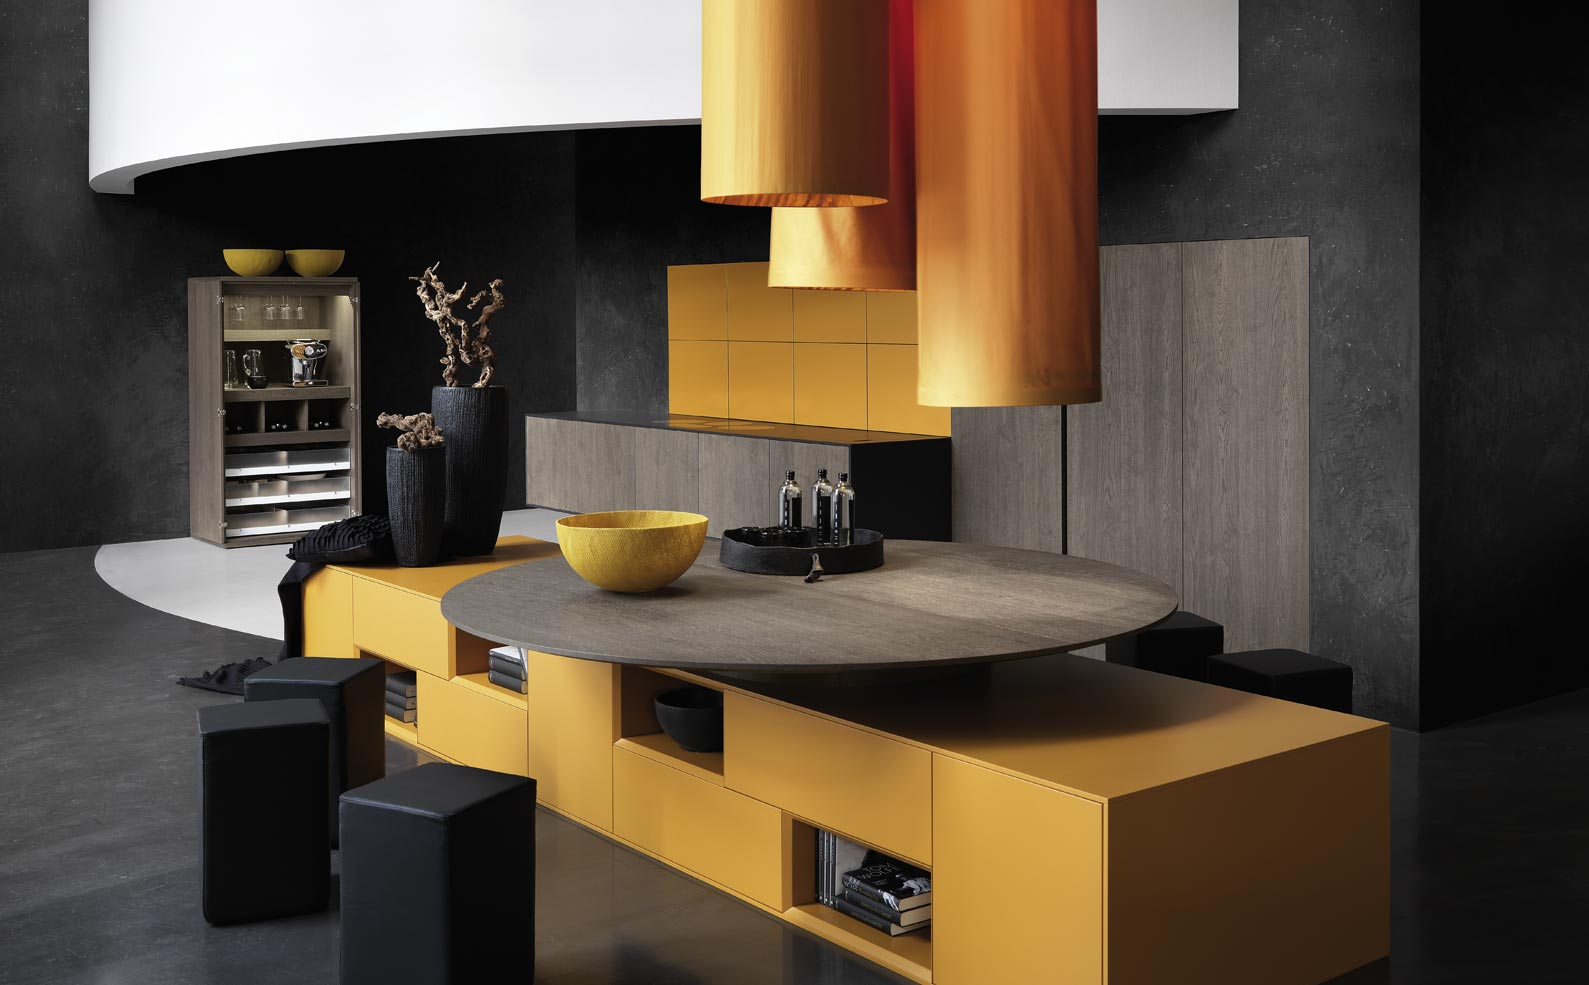 Matching Modern Kitchen Designs From Rational Interior